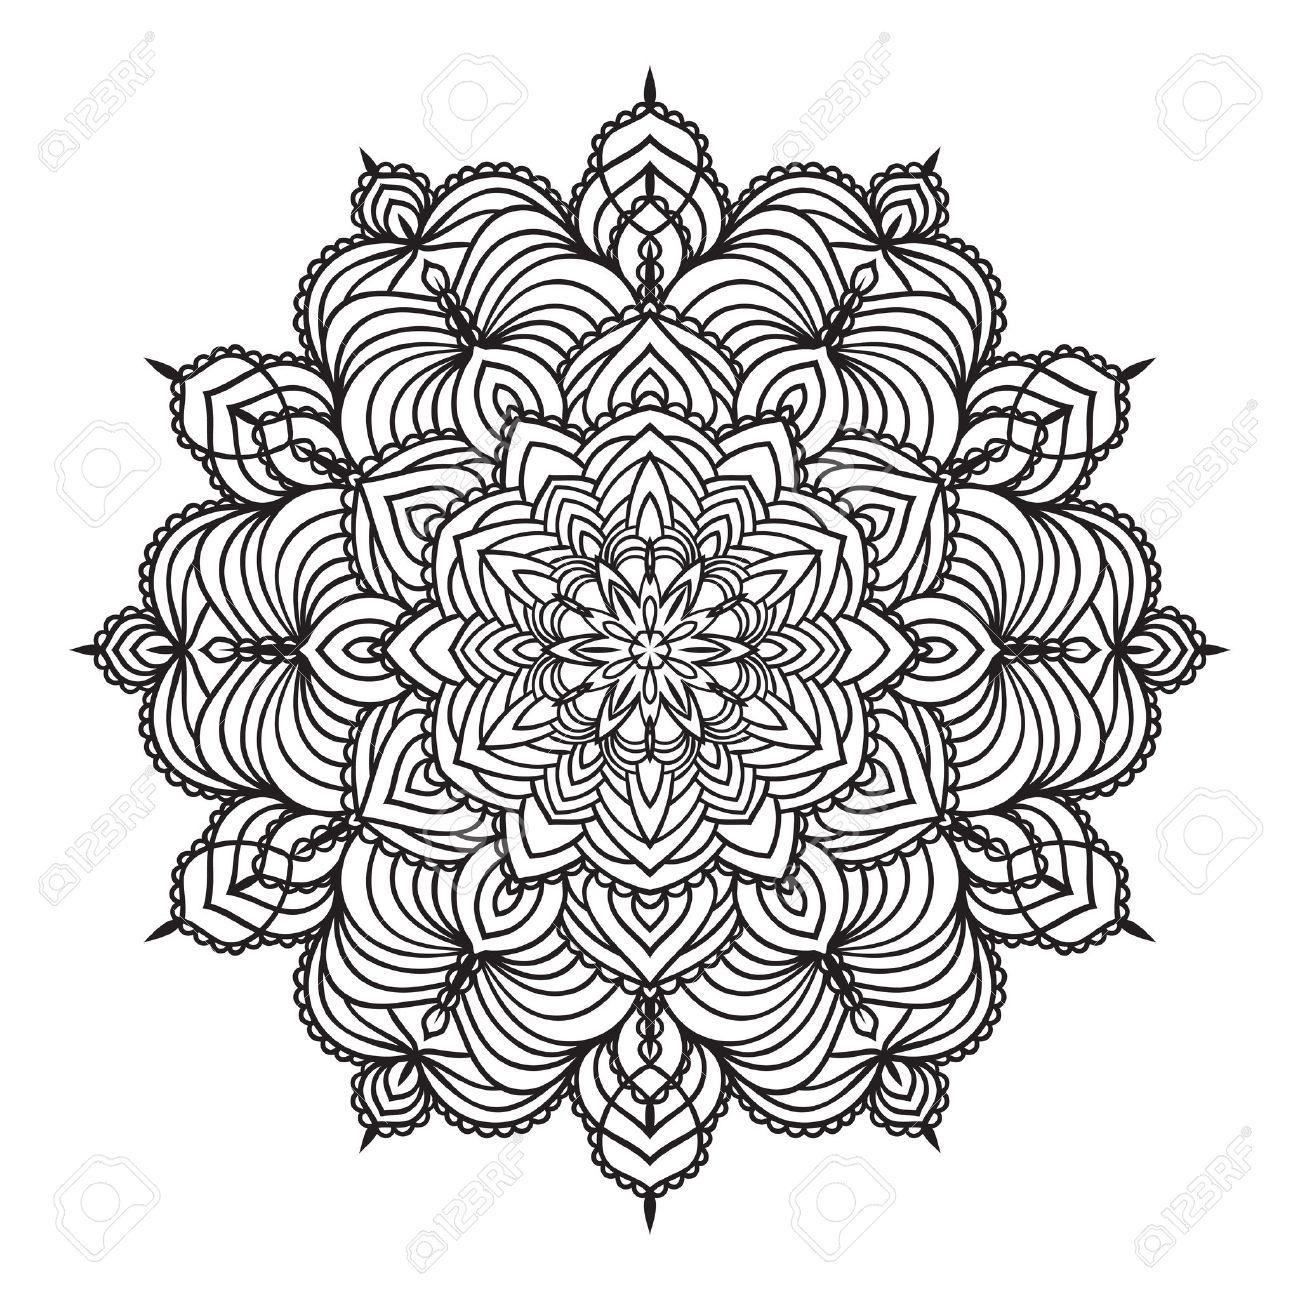 1300x1300 Hand Drawing Zentangle Element. Black And White. Flower Mandala